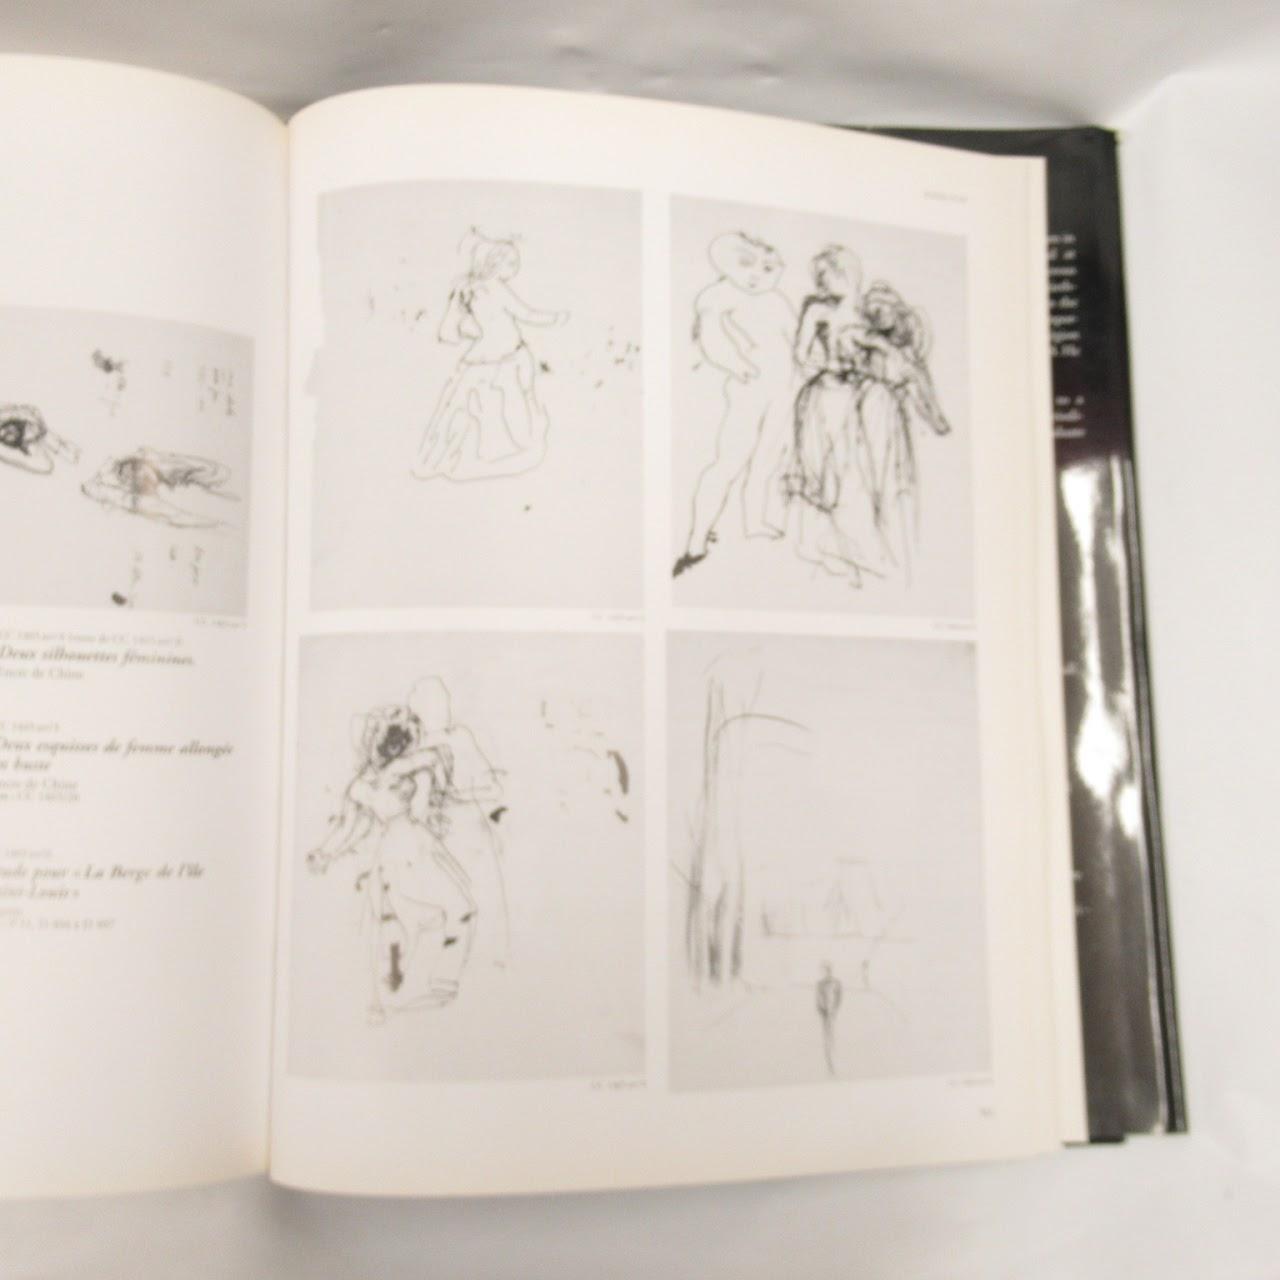 Balthus RARE 'Catalogue: Raisonné of the Complete Works' Book